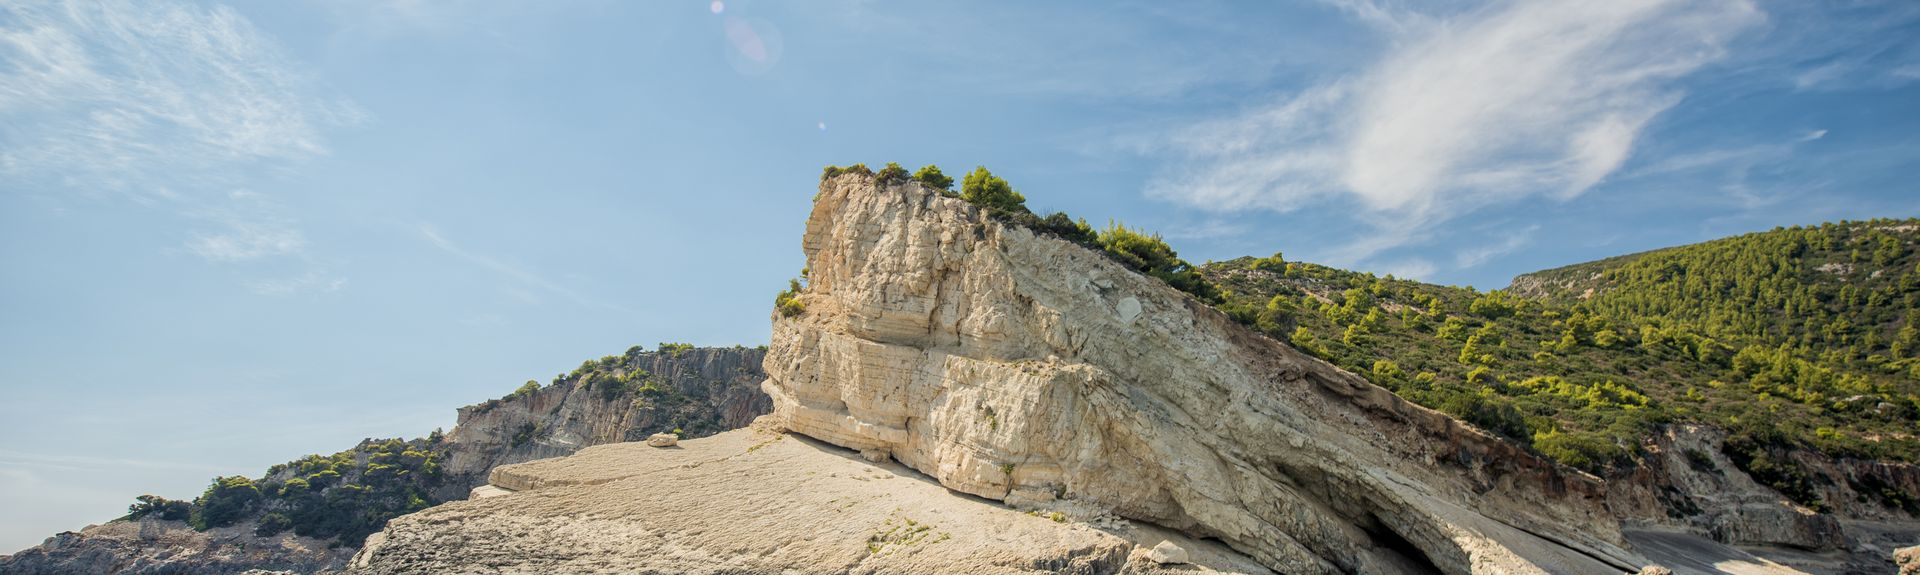 Kalamaki Strand, Laganas, Peloponnese, West Greece and Ionian Sea, Grækenland